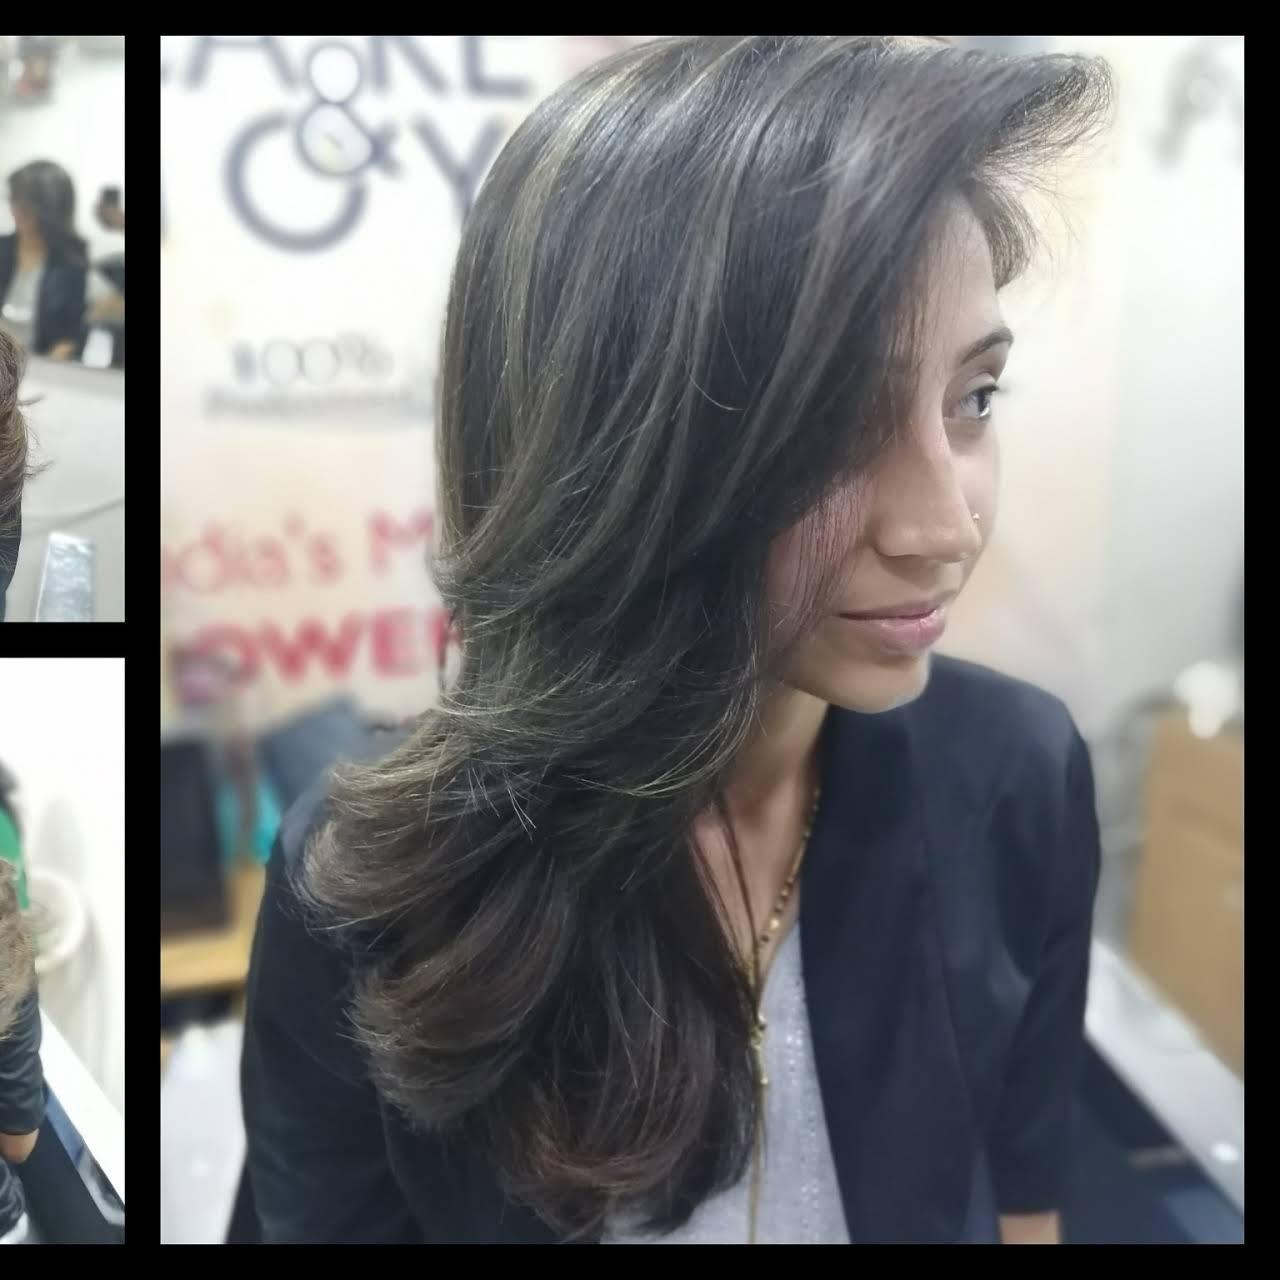 Pushp hair & beauty care